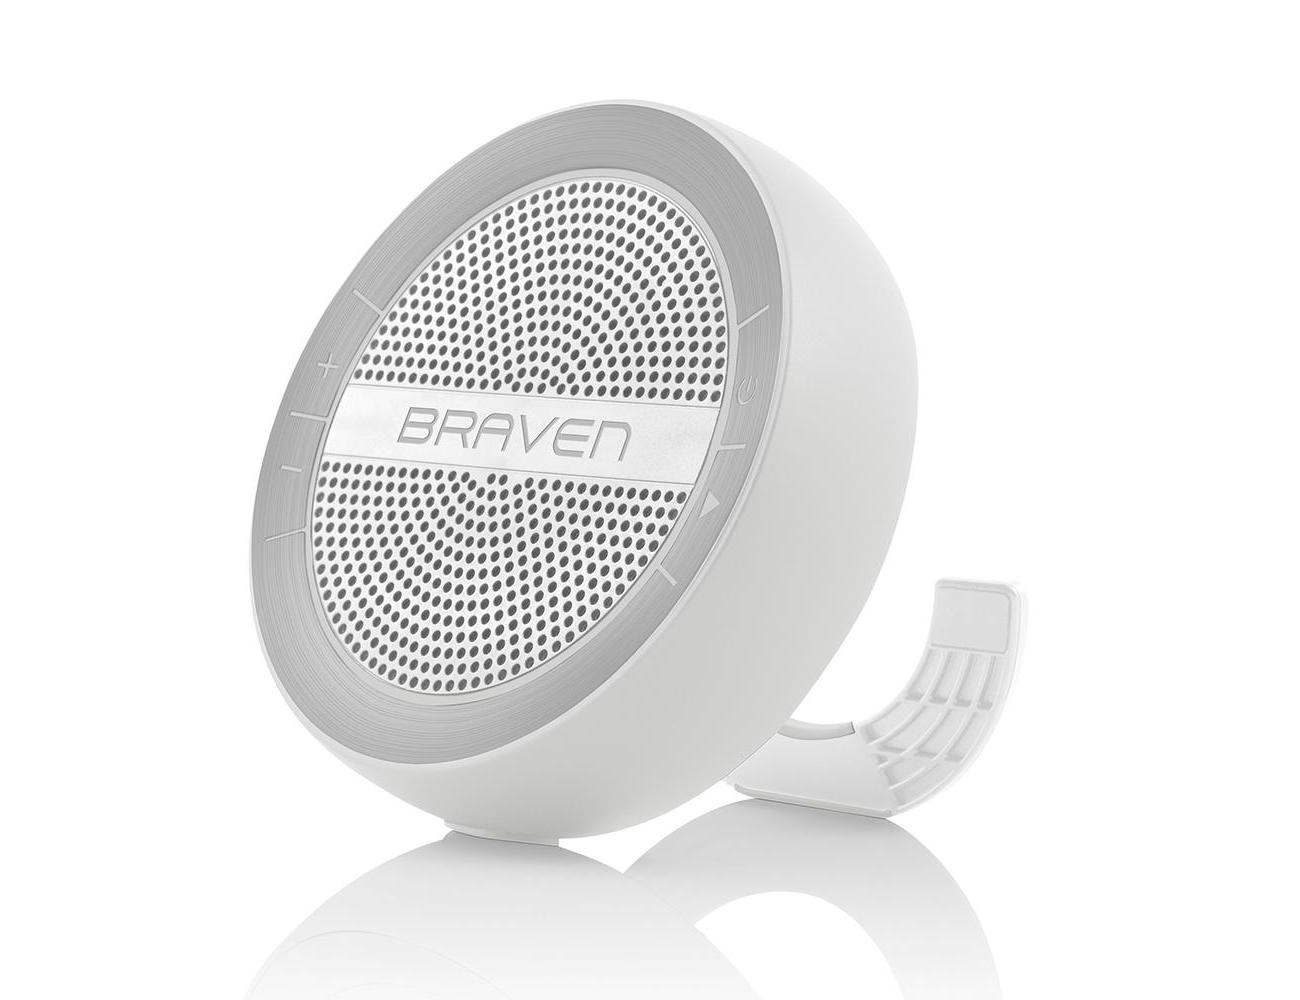 Braven Mira Portable Wireless Weatherproof Speaker